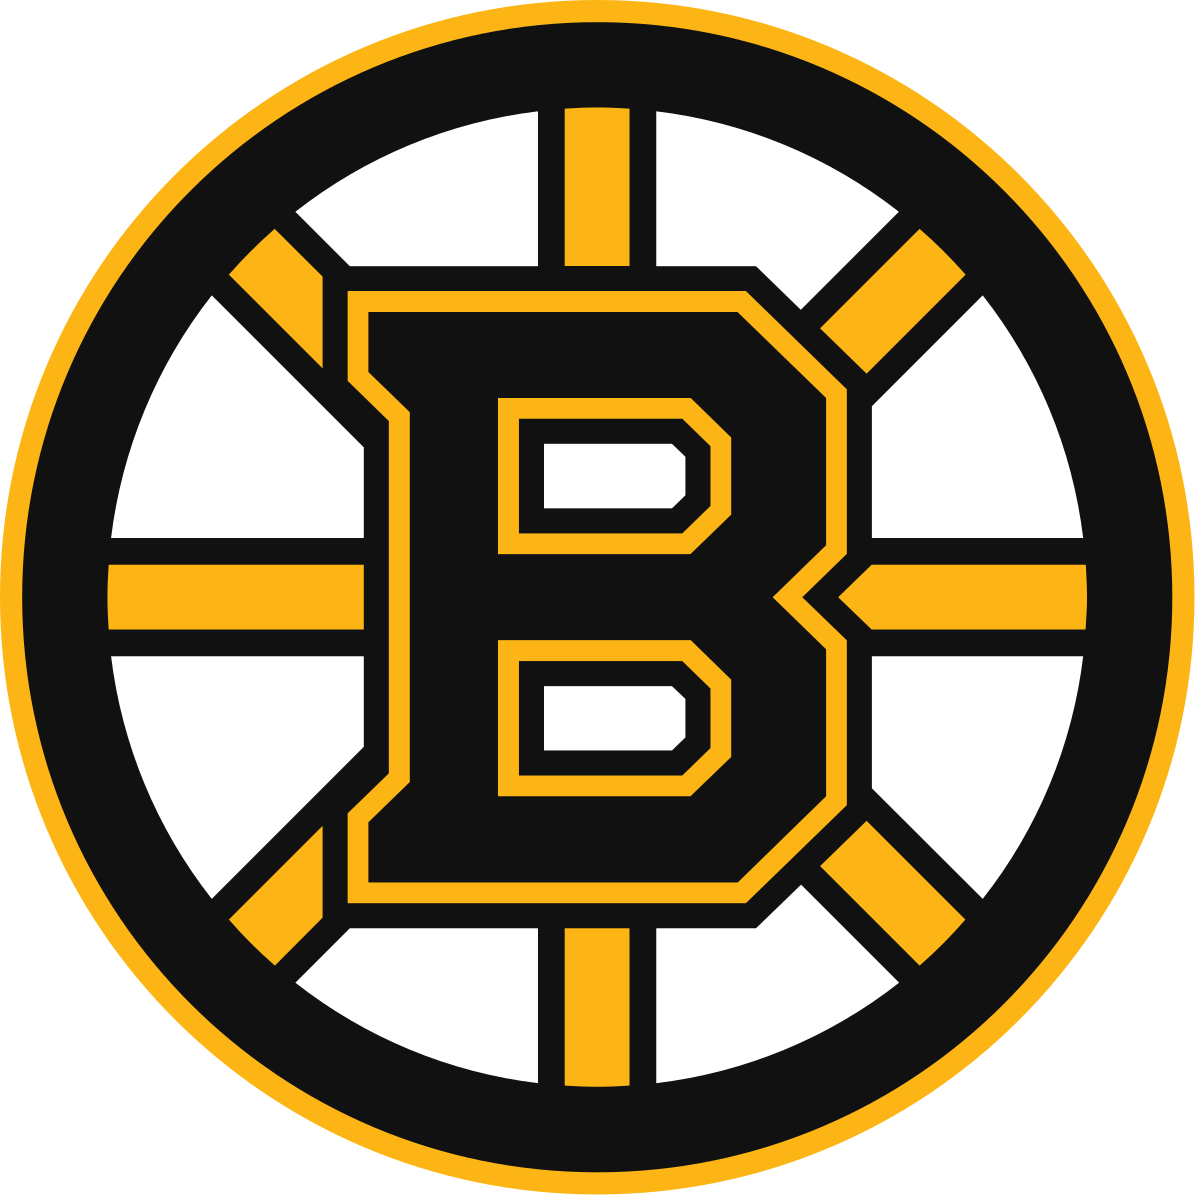 Baseball batter patriots clipart image library library Boston Bruins - Wikipedia image library library